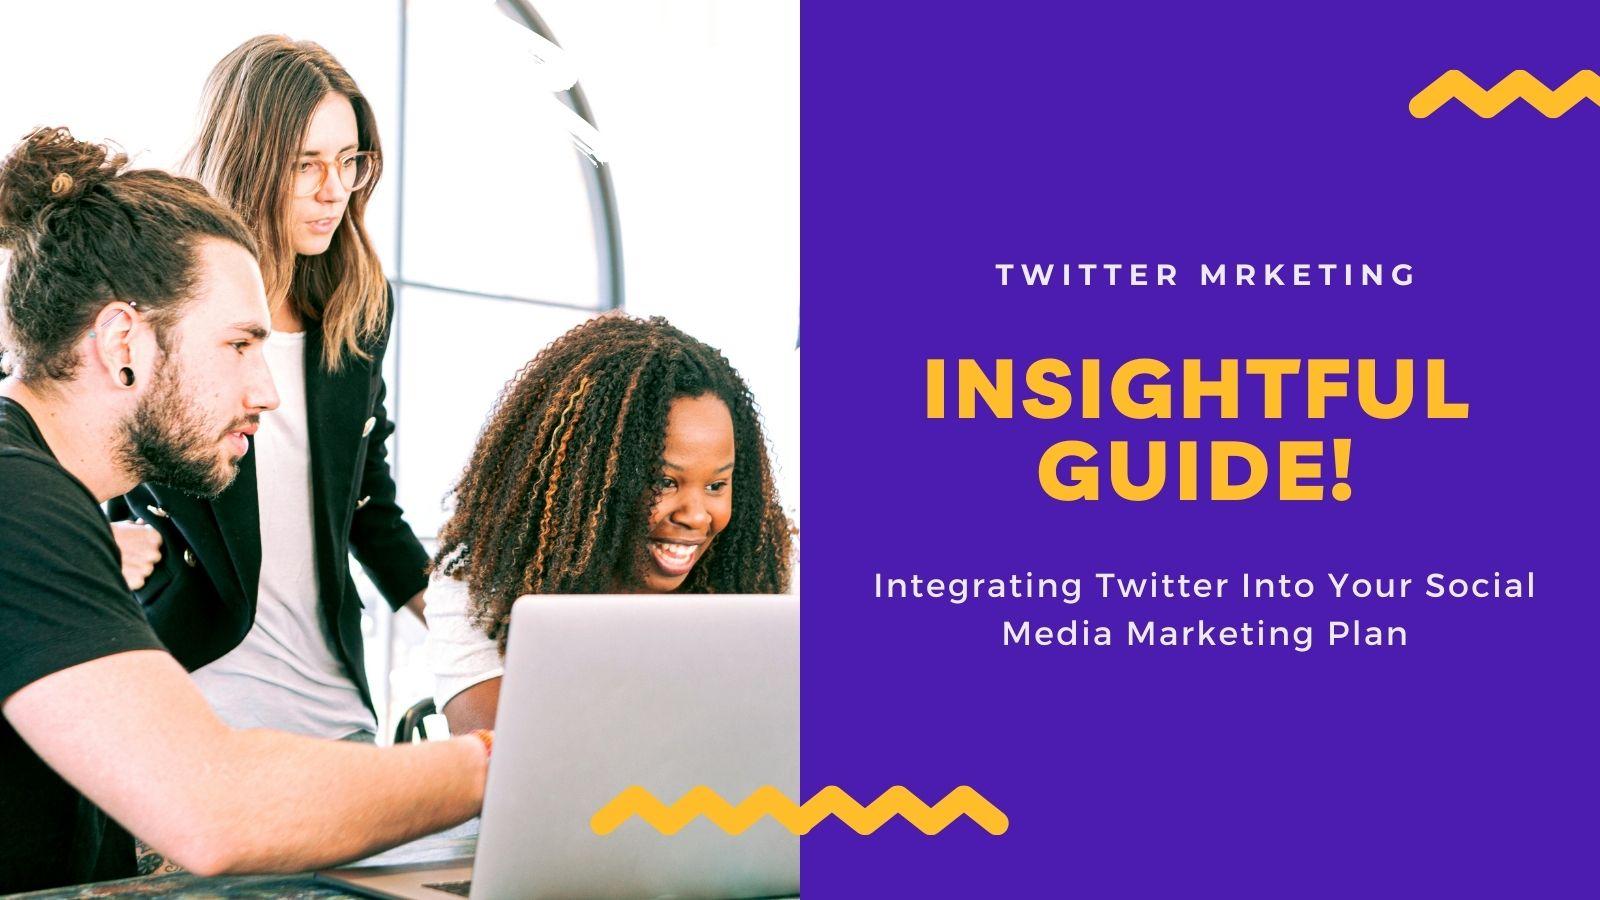 Integrating Twitter Into Your Social Media Marketing Plan